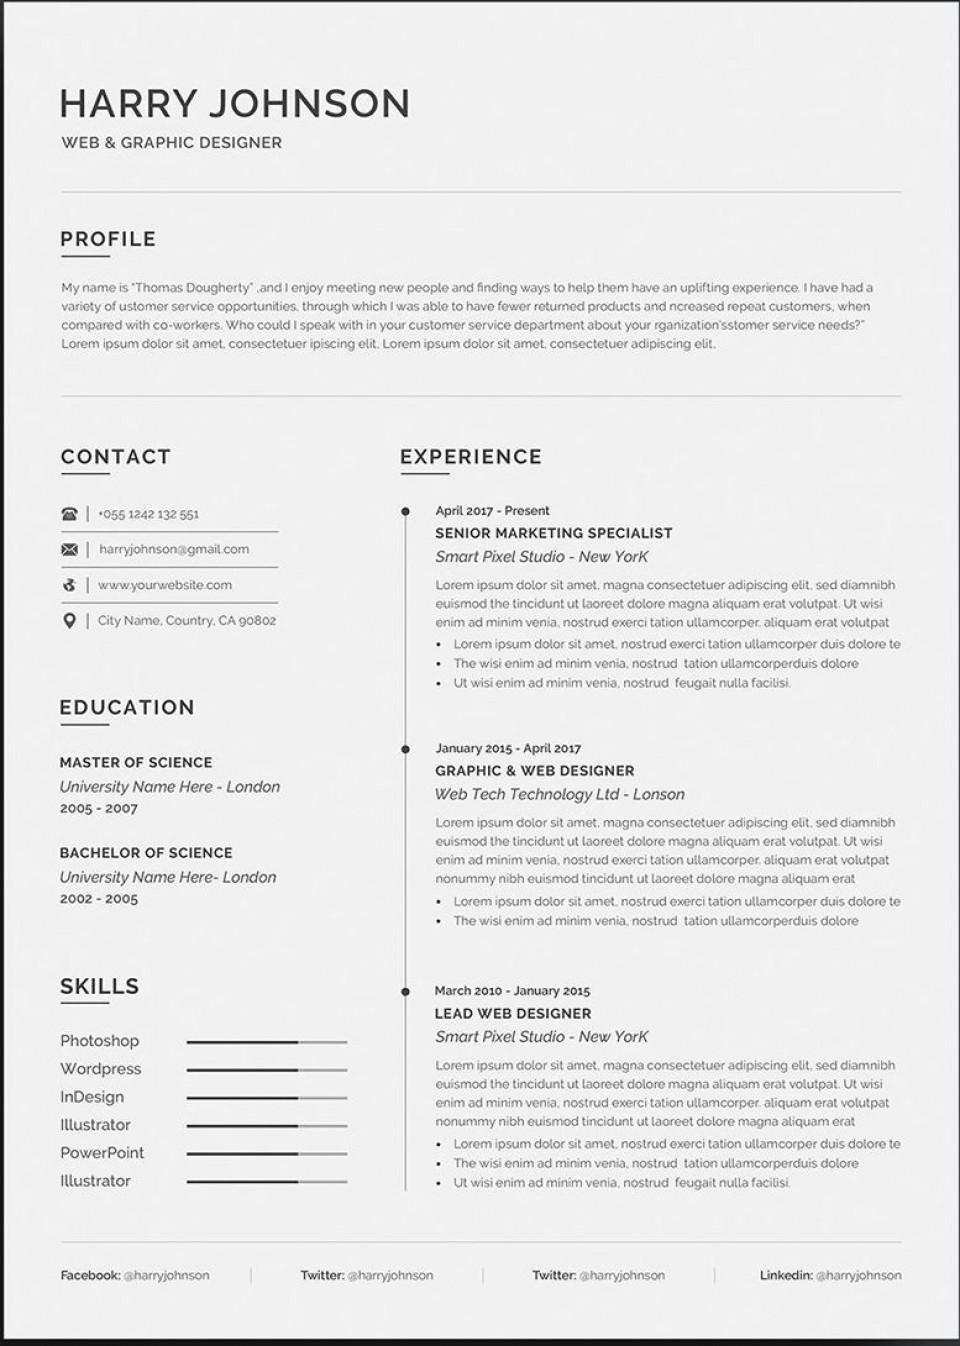 004 Amazing Microsoft Word Resume Template High Resolution  Reddit 2019 2010 Free Download960